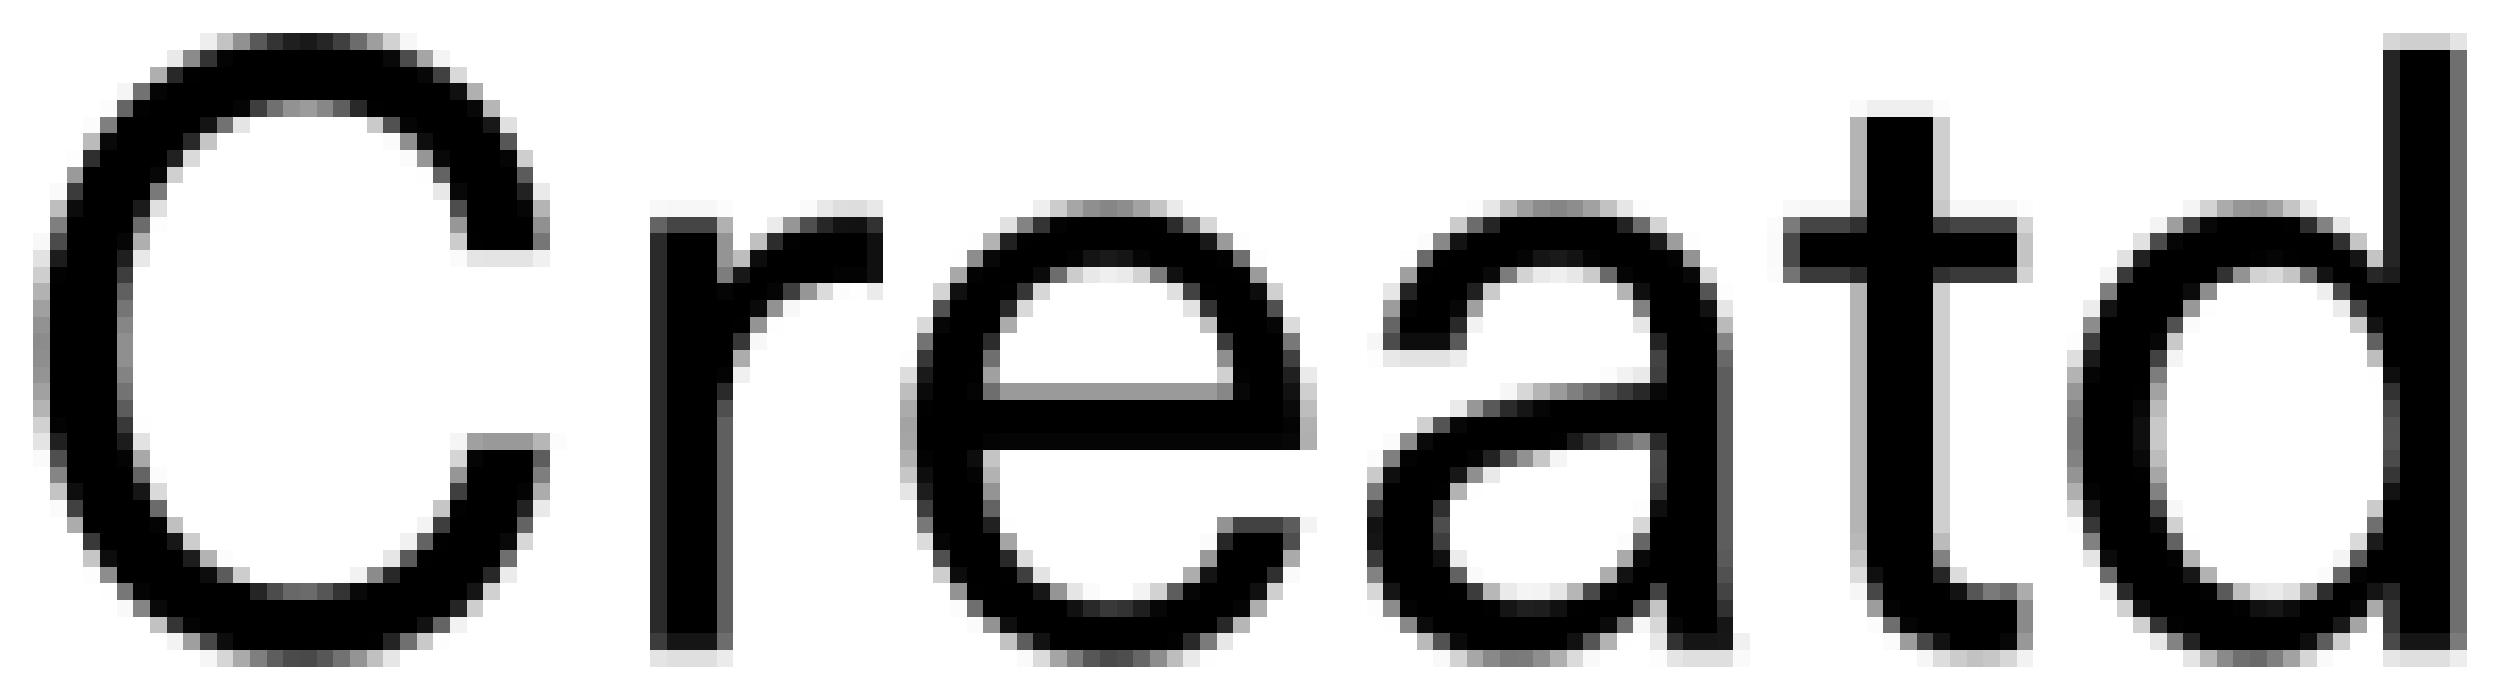 CRTD logo